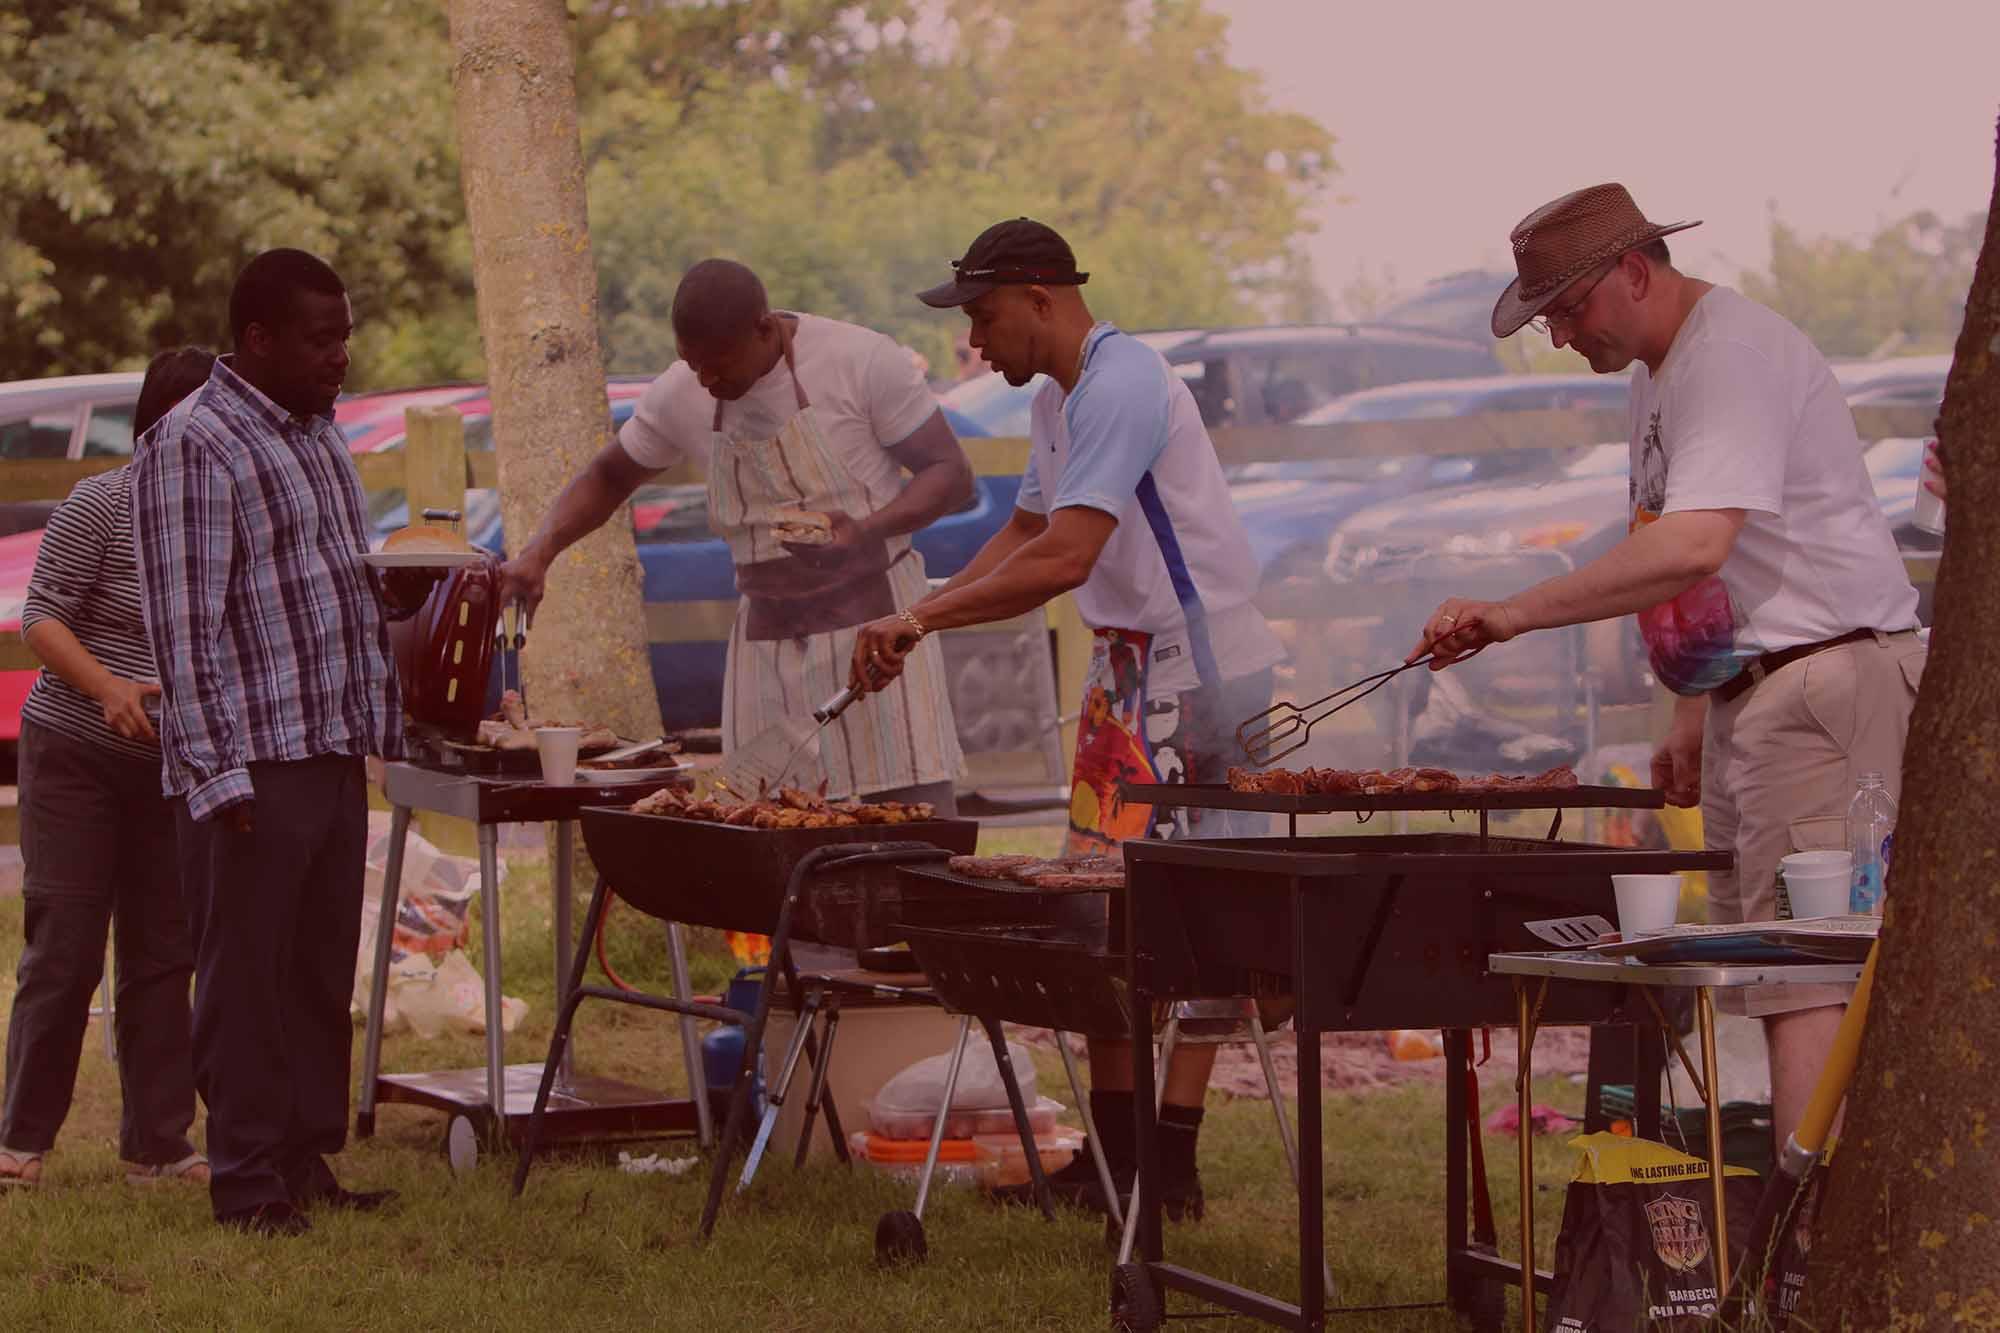 Men Cooking a BBQ